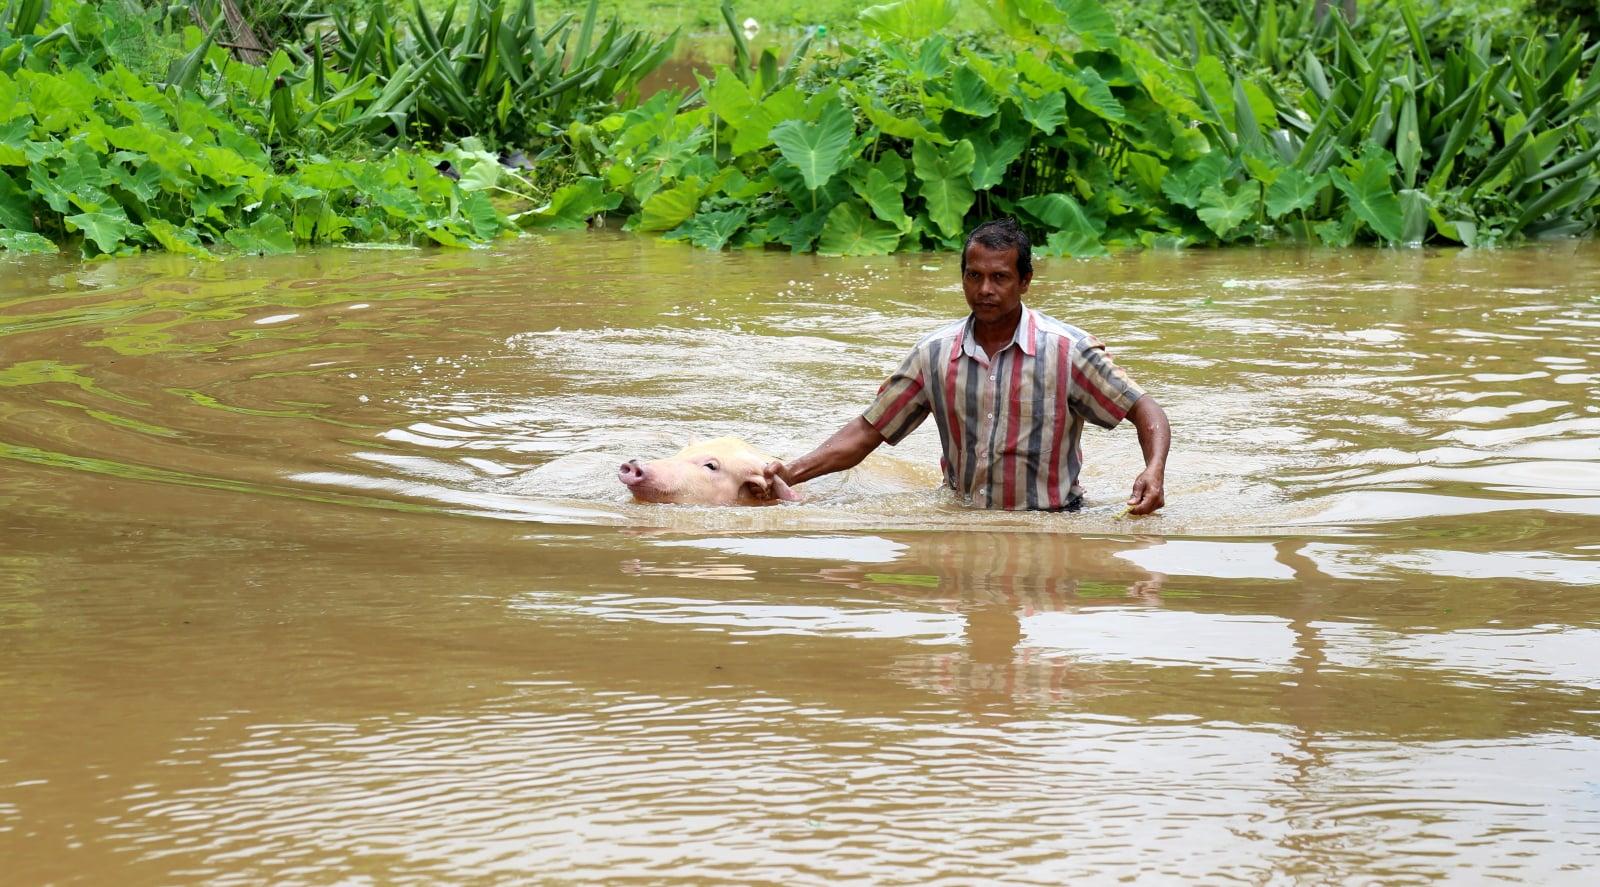 Powodzie w Indiach fot. EPA/PRAKASH ELAMAKKARA